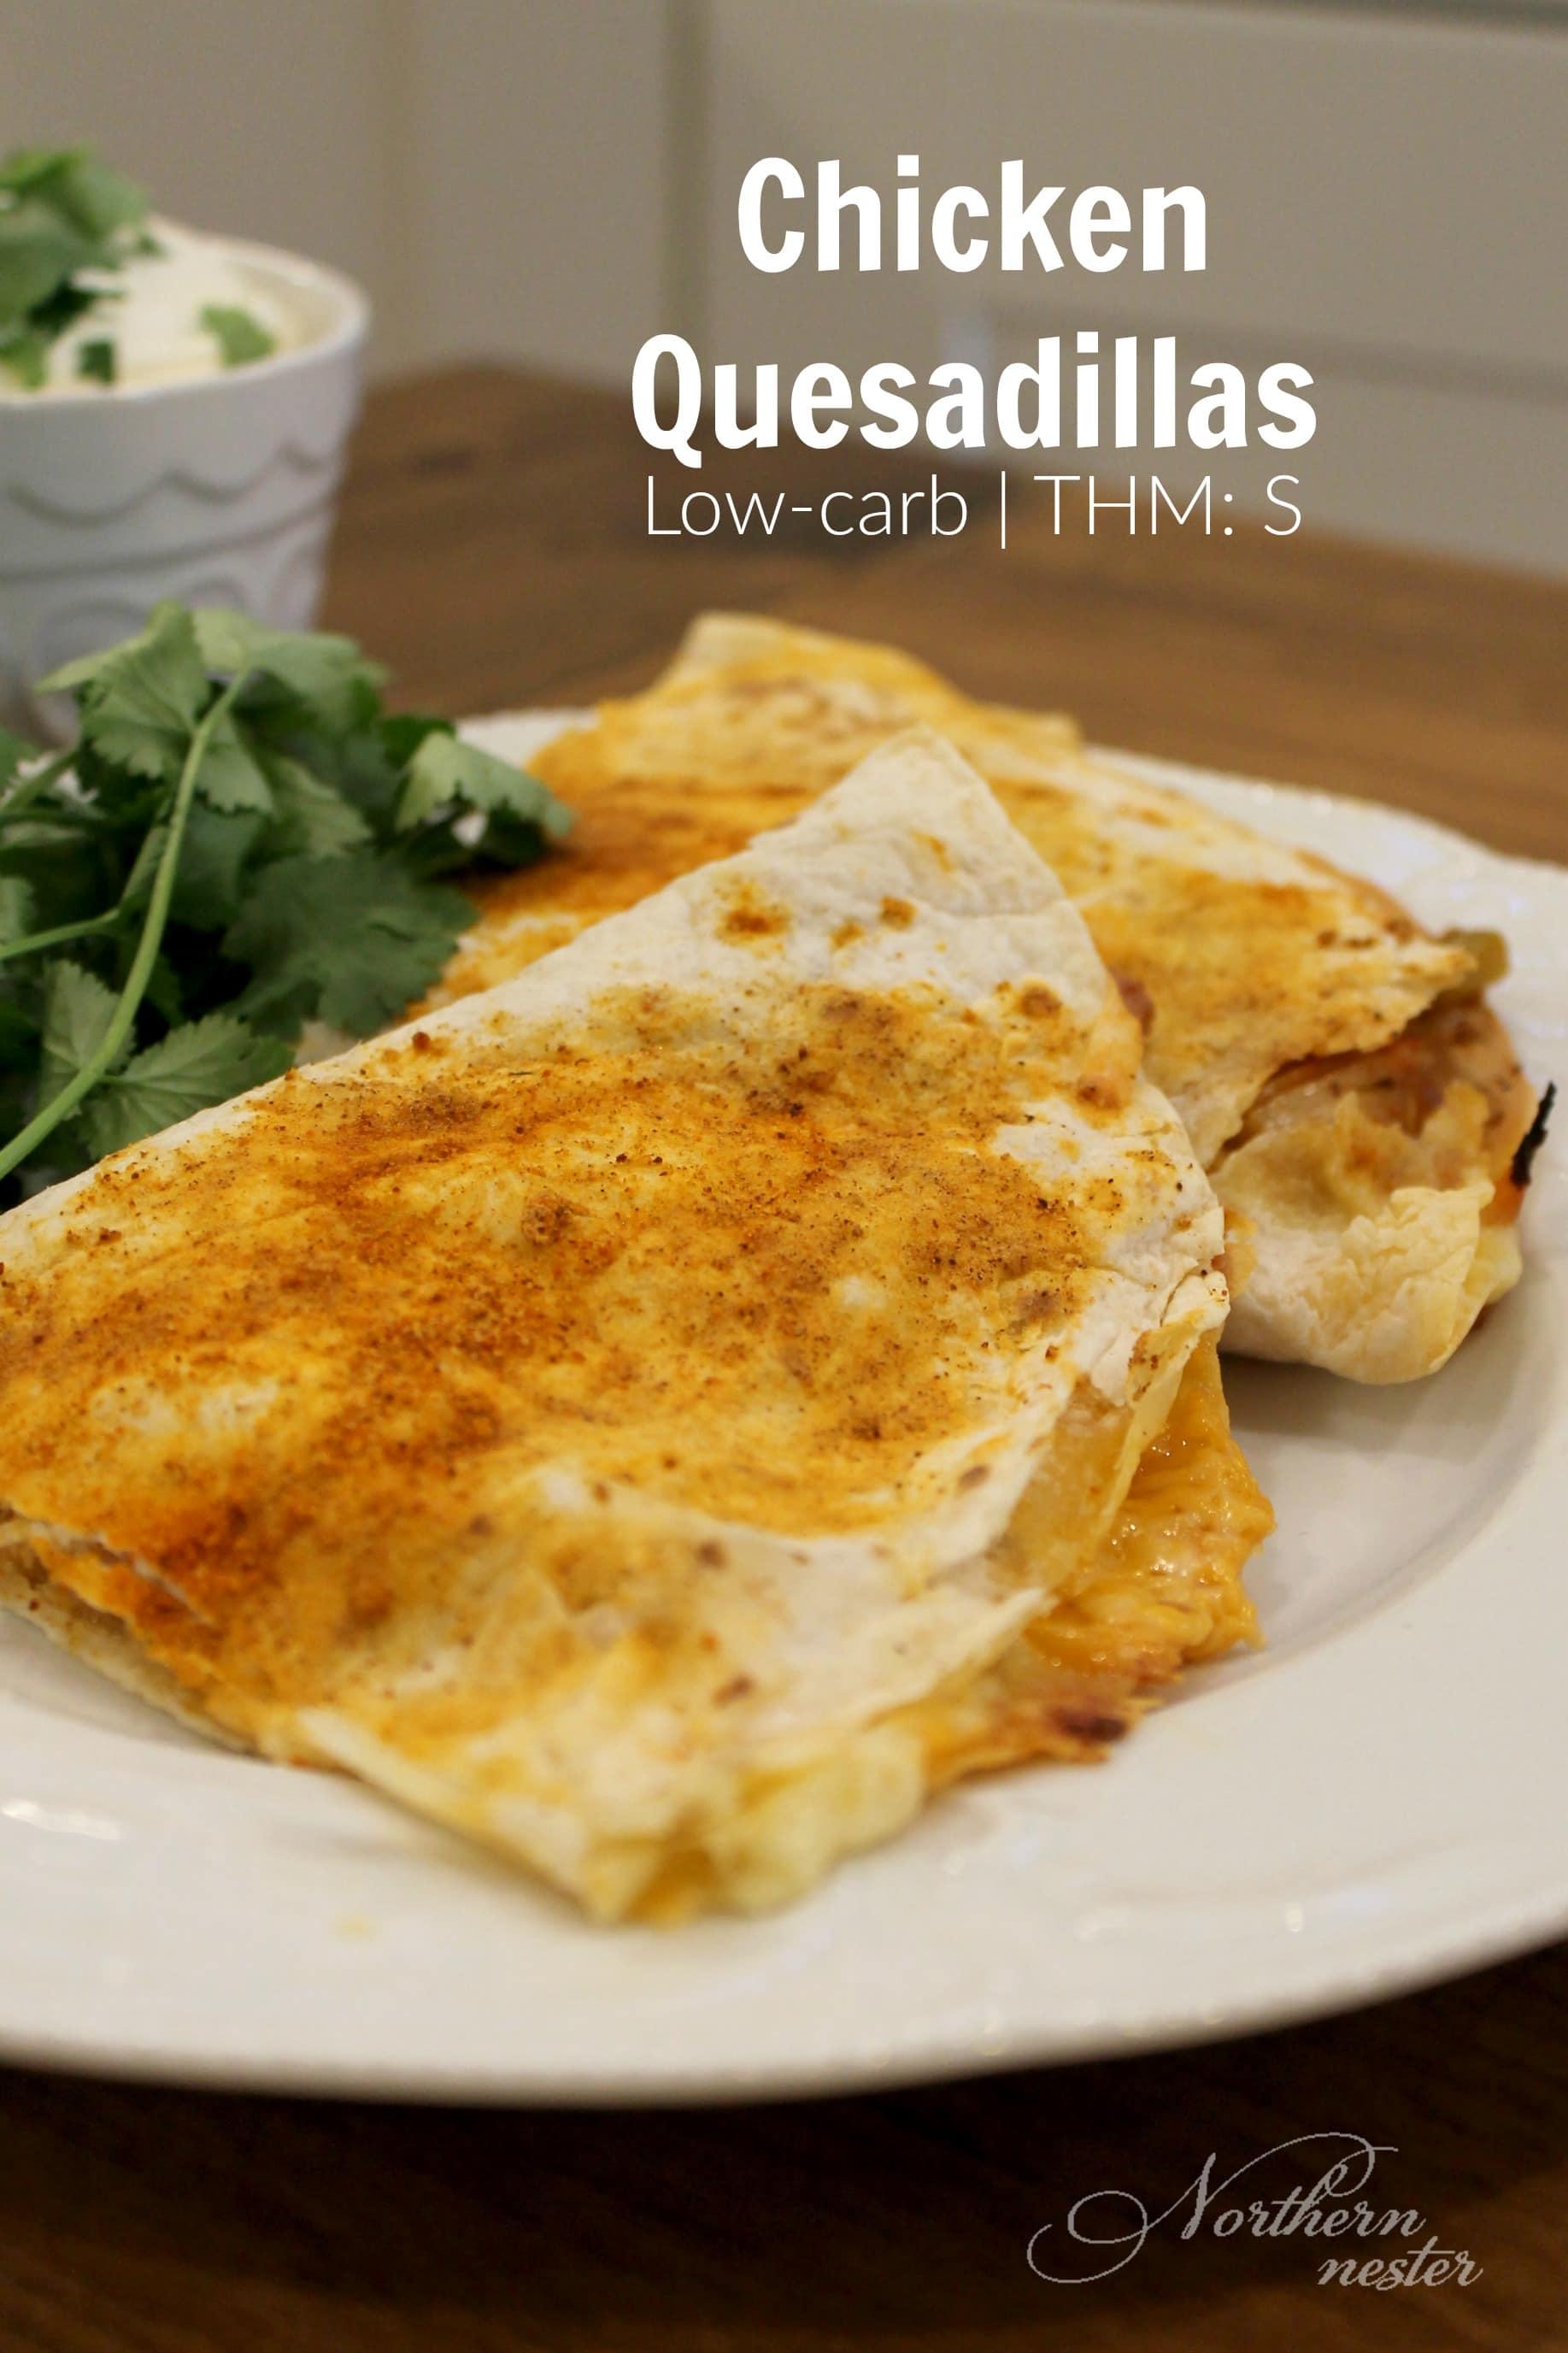 Chicken Quesadillas - Northern Nester